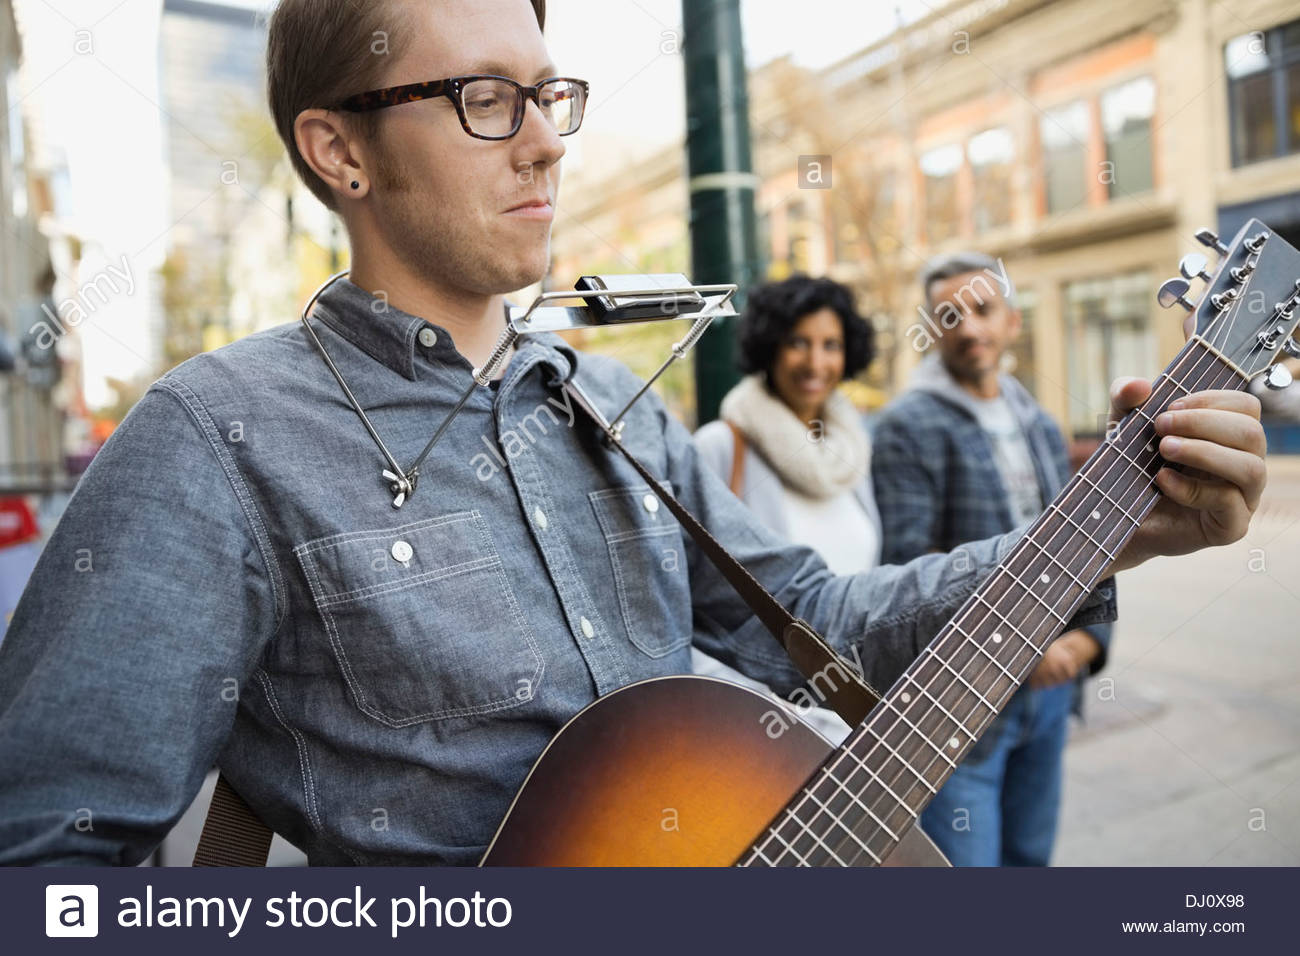 Street musician entertaining pedestrians - Stock Image